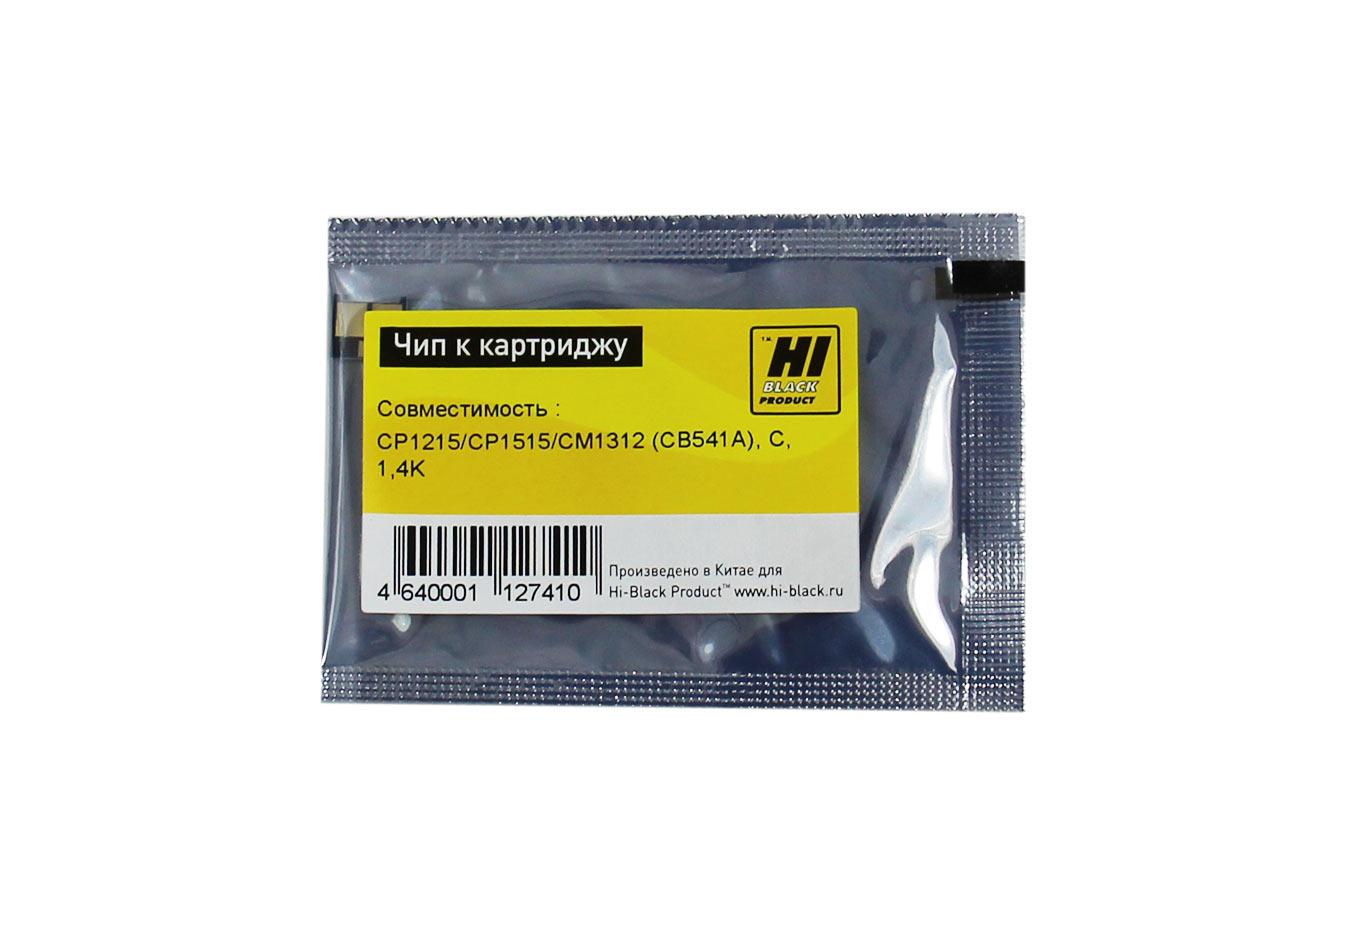 Чип Hi-Black к картриджу HP CLJ CP1215/CP1515/CM1312 (CB542A), Y, 1,4K